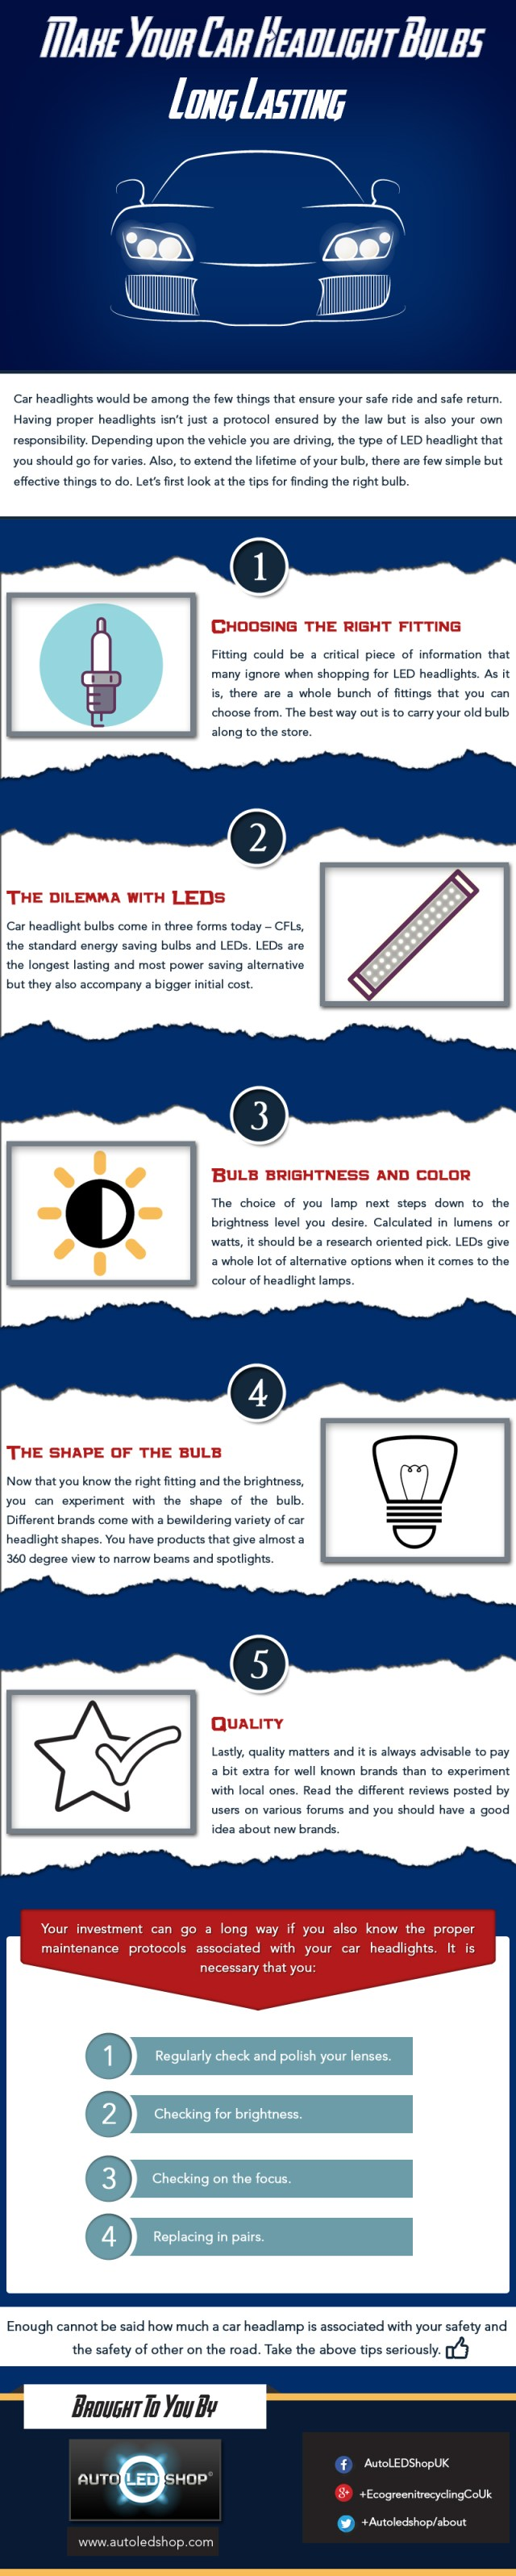 Make Your Car Headlight Bulbs Long Lasting